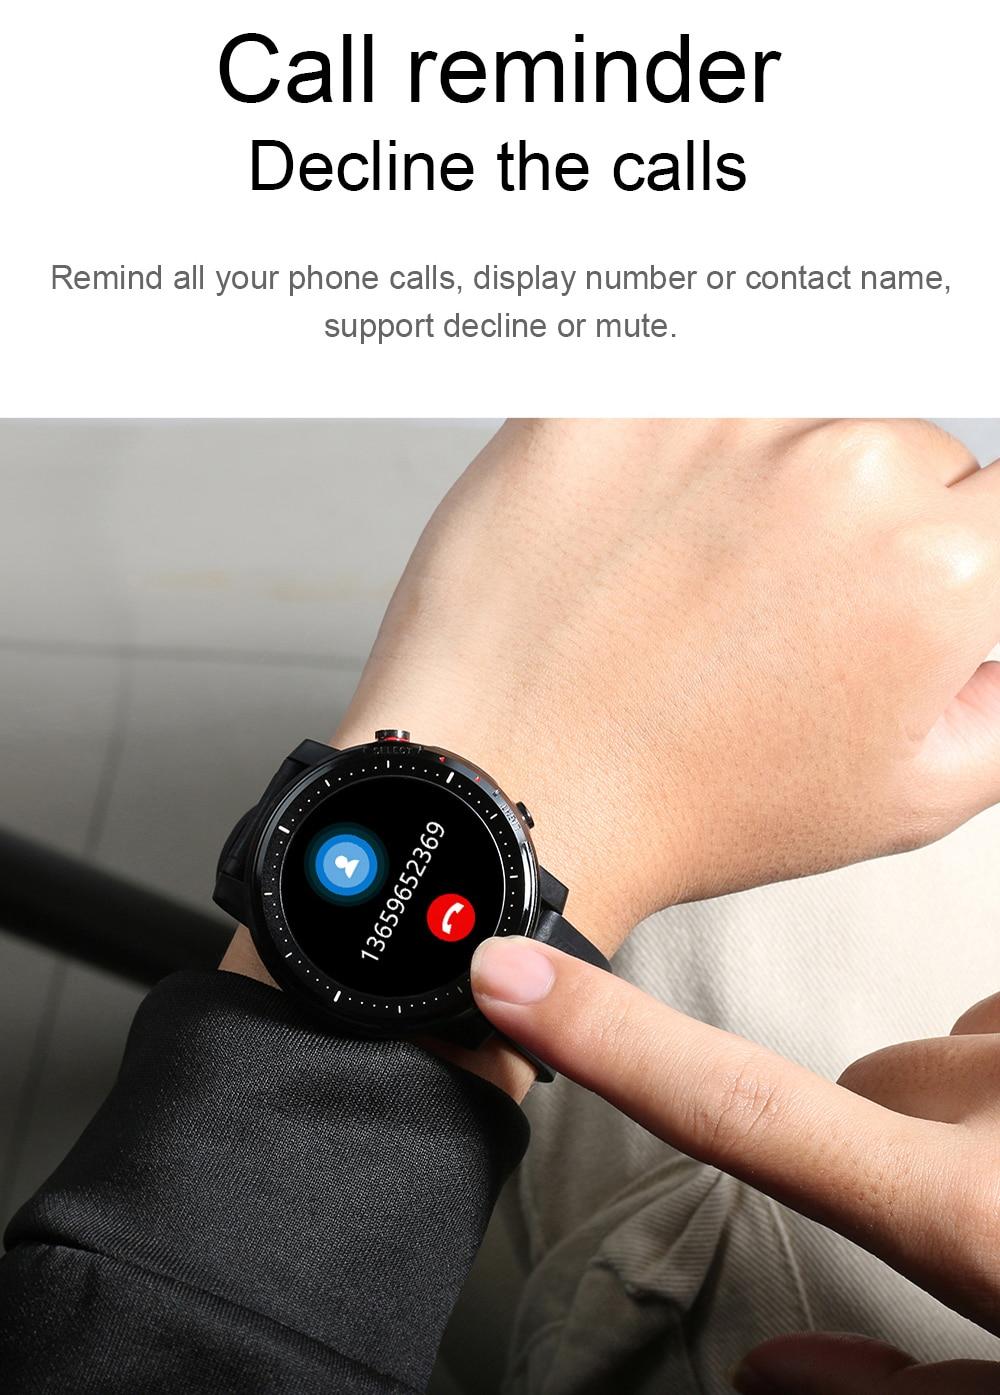 H5347871e9e444d3c93db091351d1991aj Timewolf Reloj Inteligente Smart Watch Men 2021 IP68 Waterproof Android Smartwatch Smart Watch for Men Women Android Phone IOS